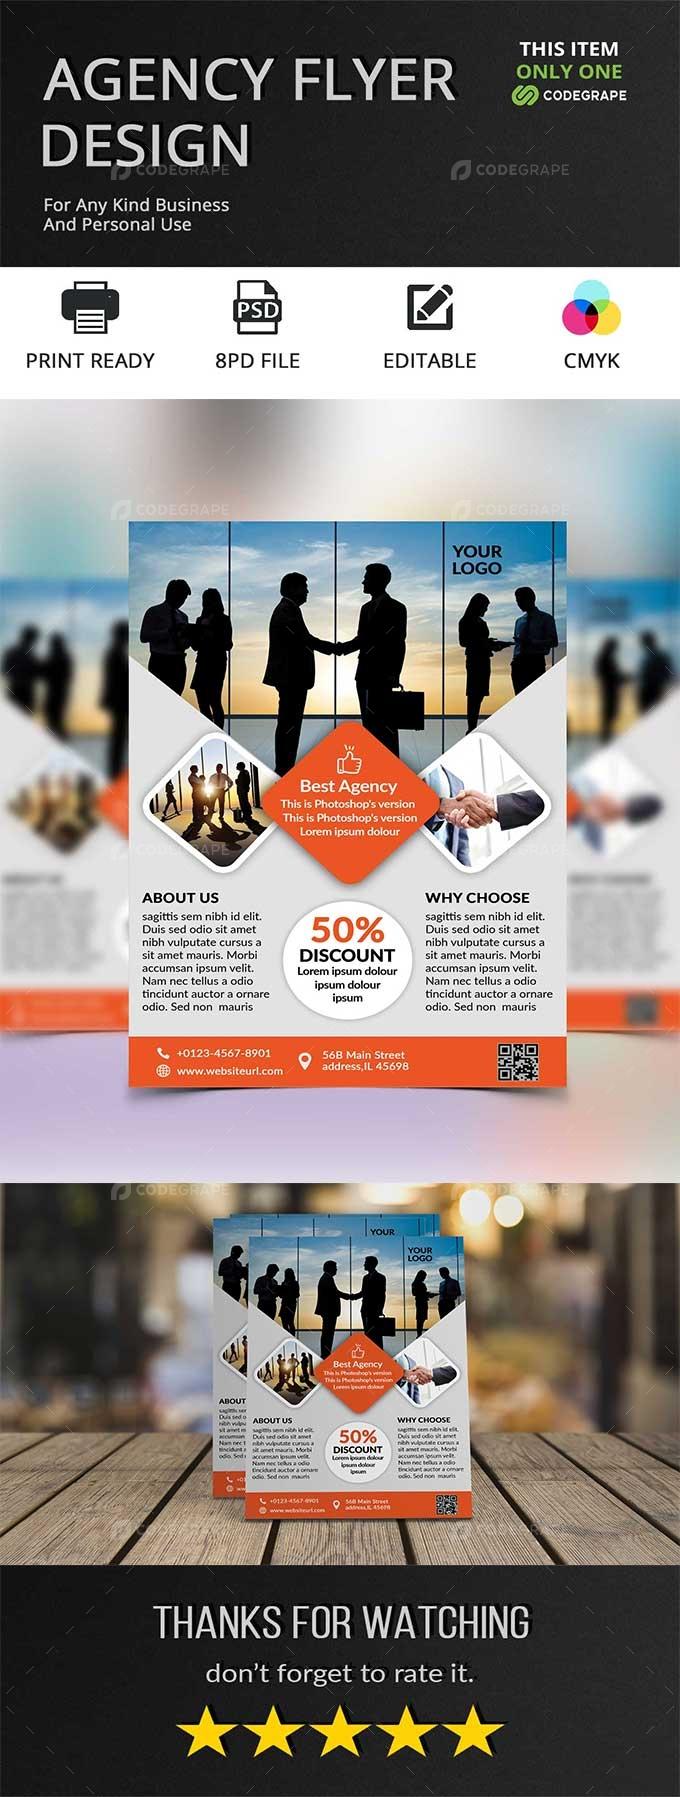 Agency Flyer Design